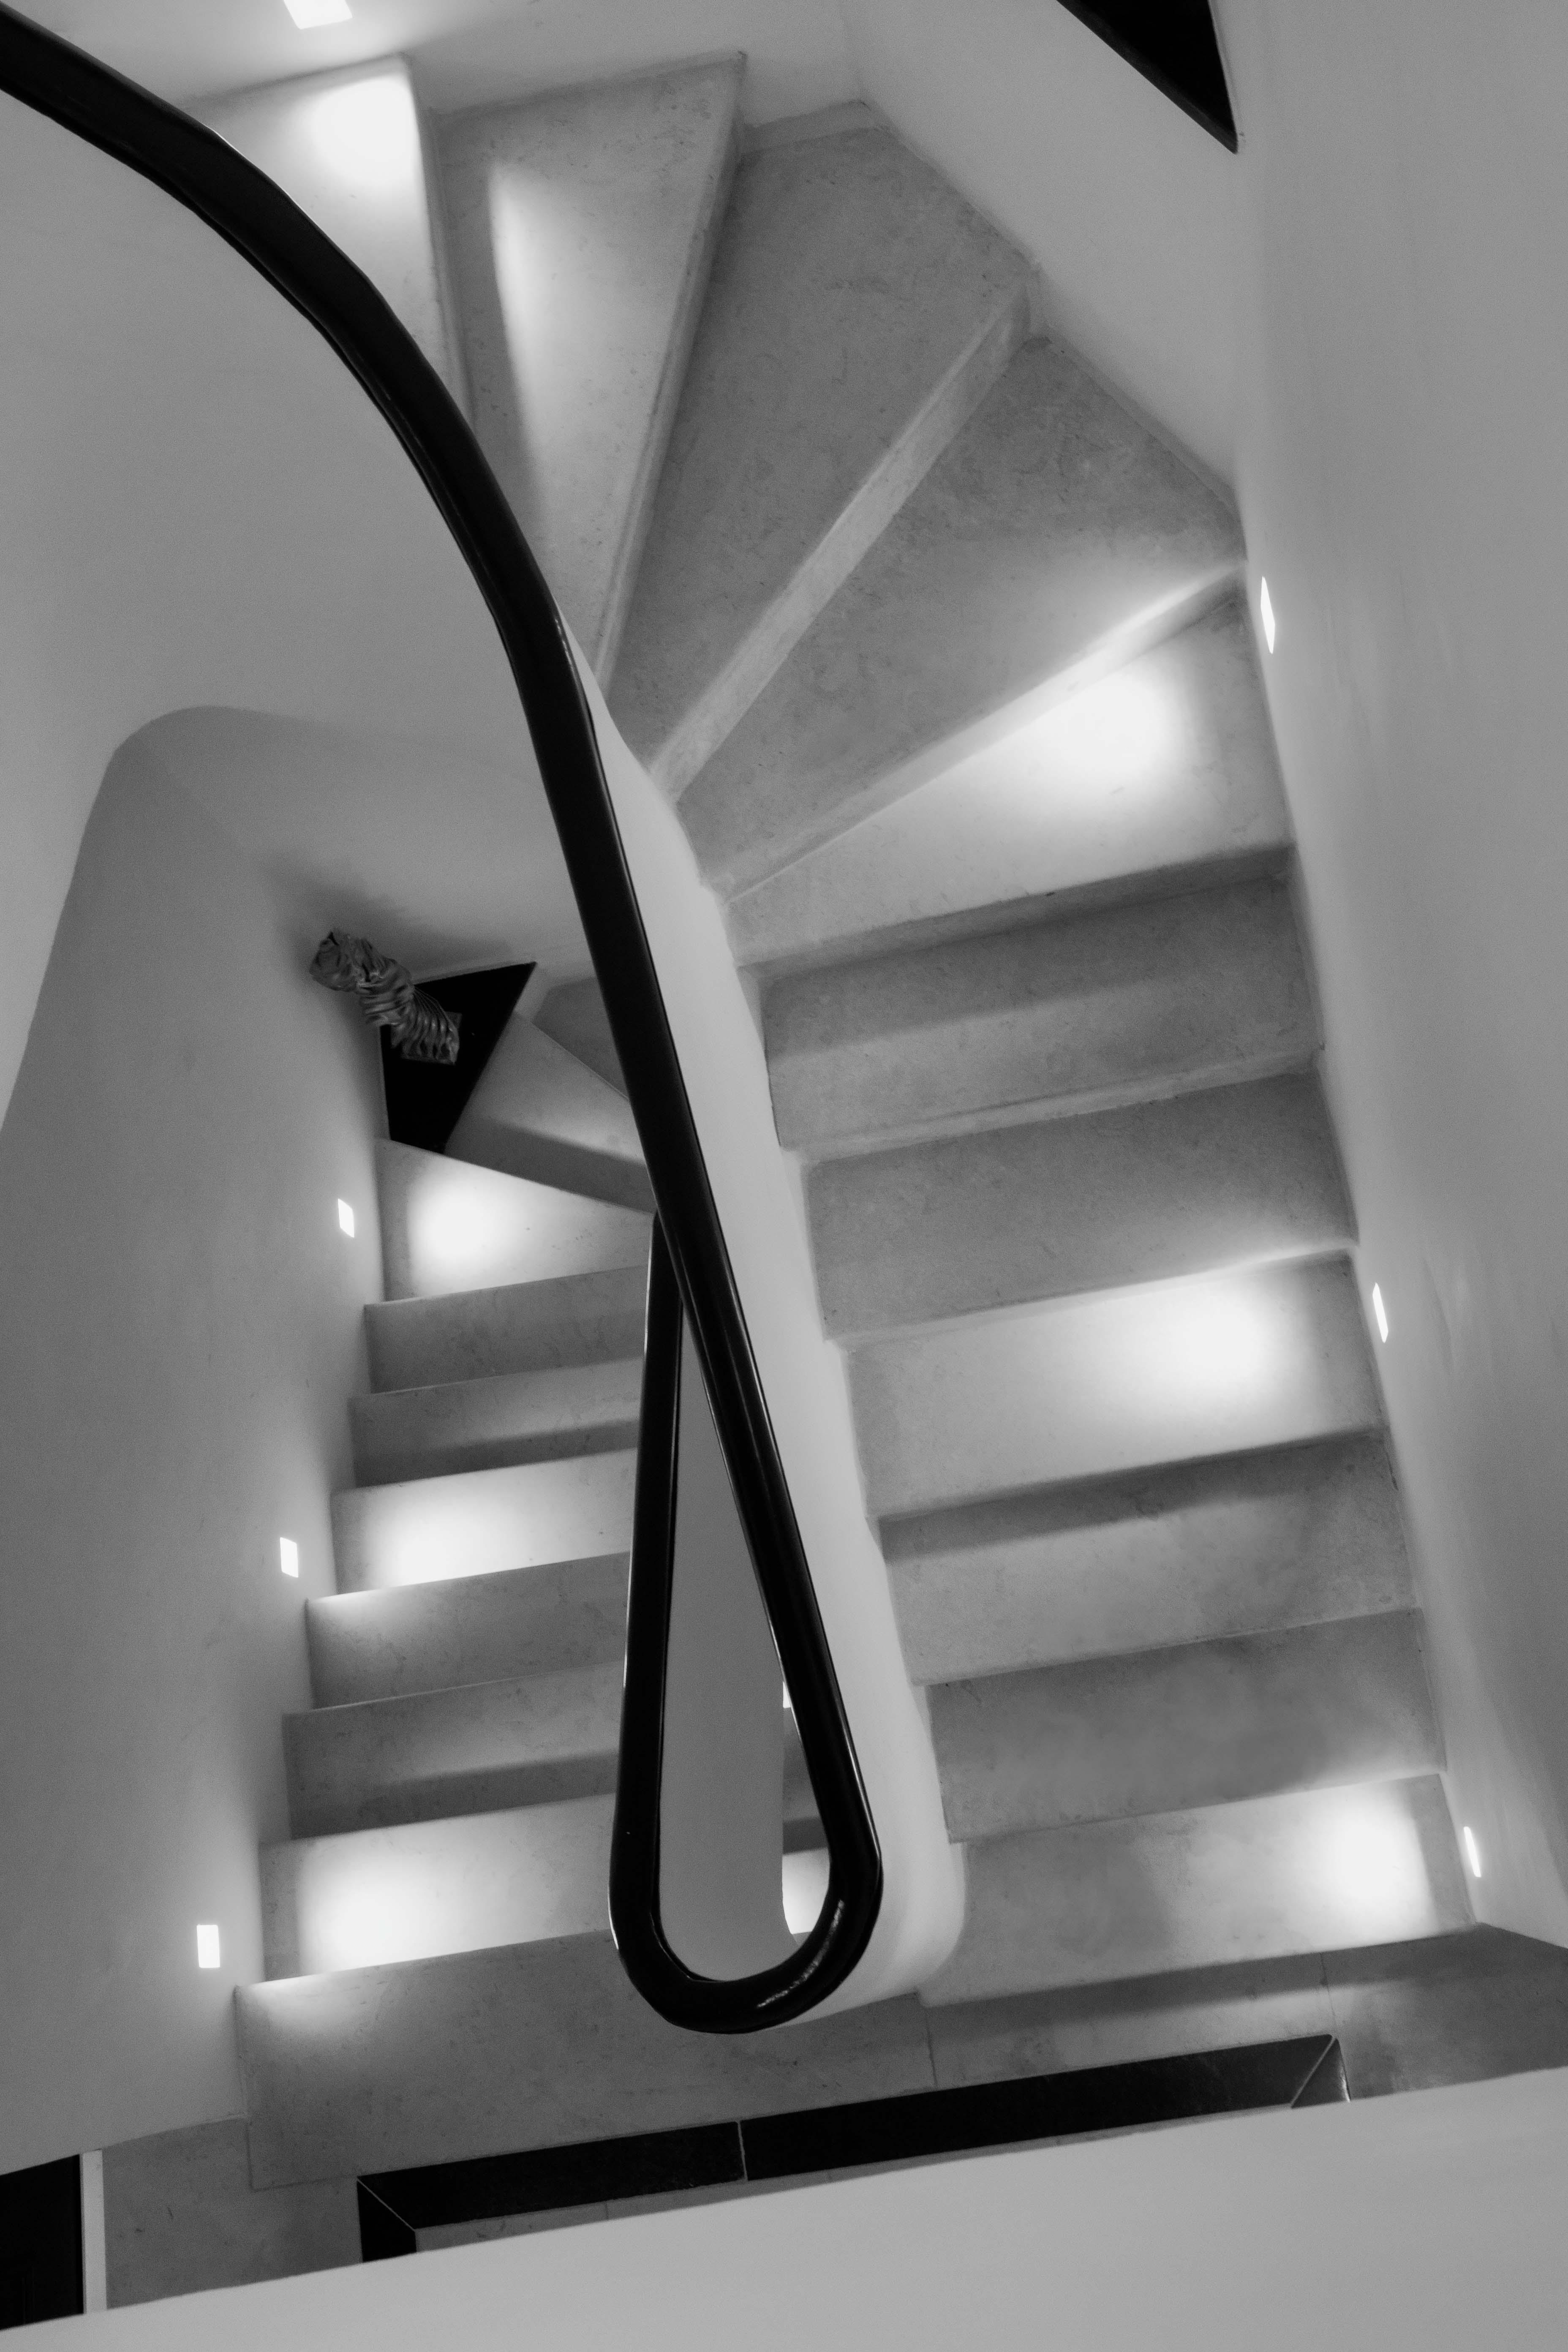 Stairway, Aix-en-Provence